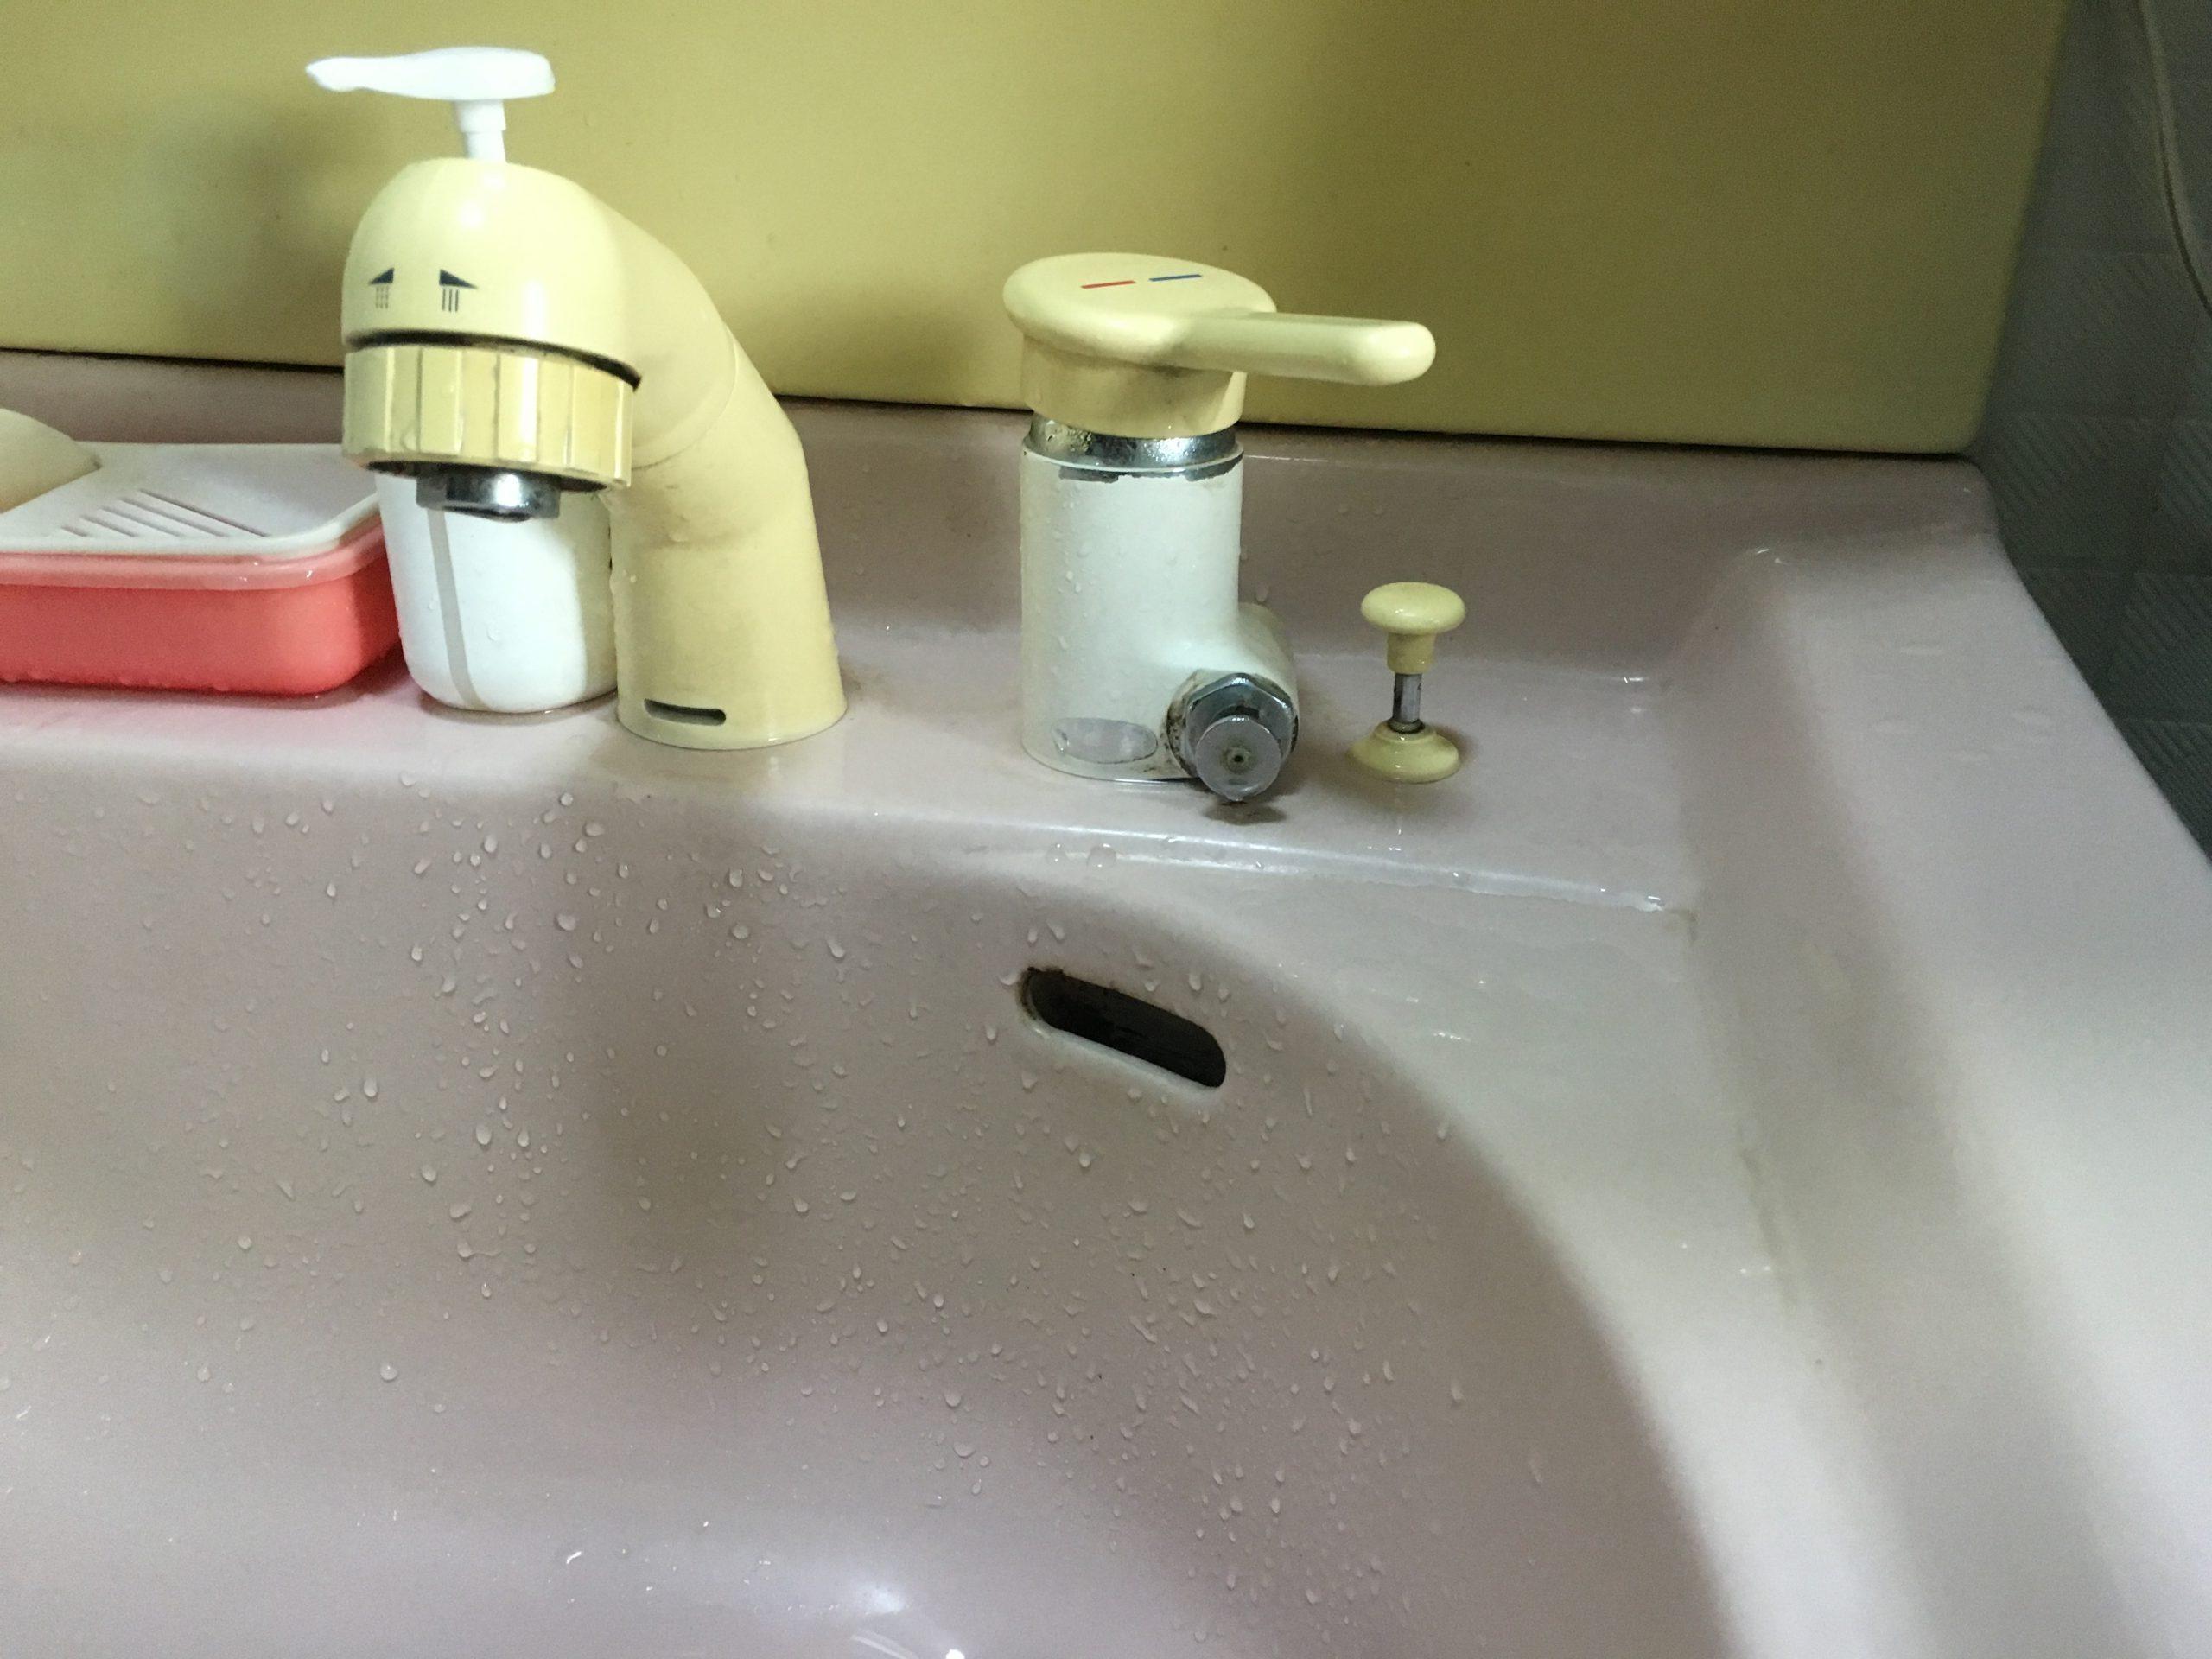 MYMシャワー混合栓